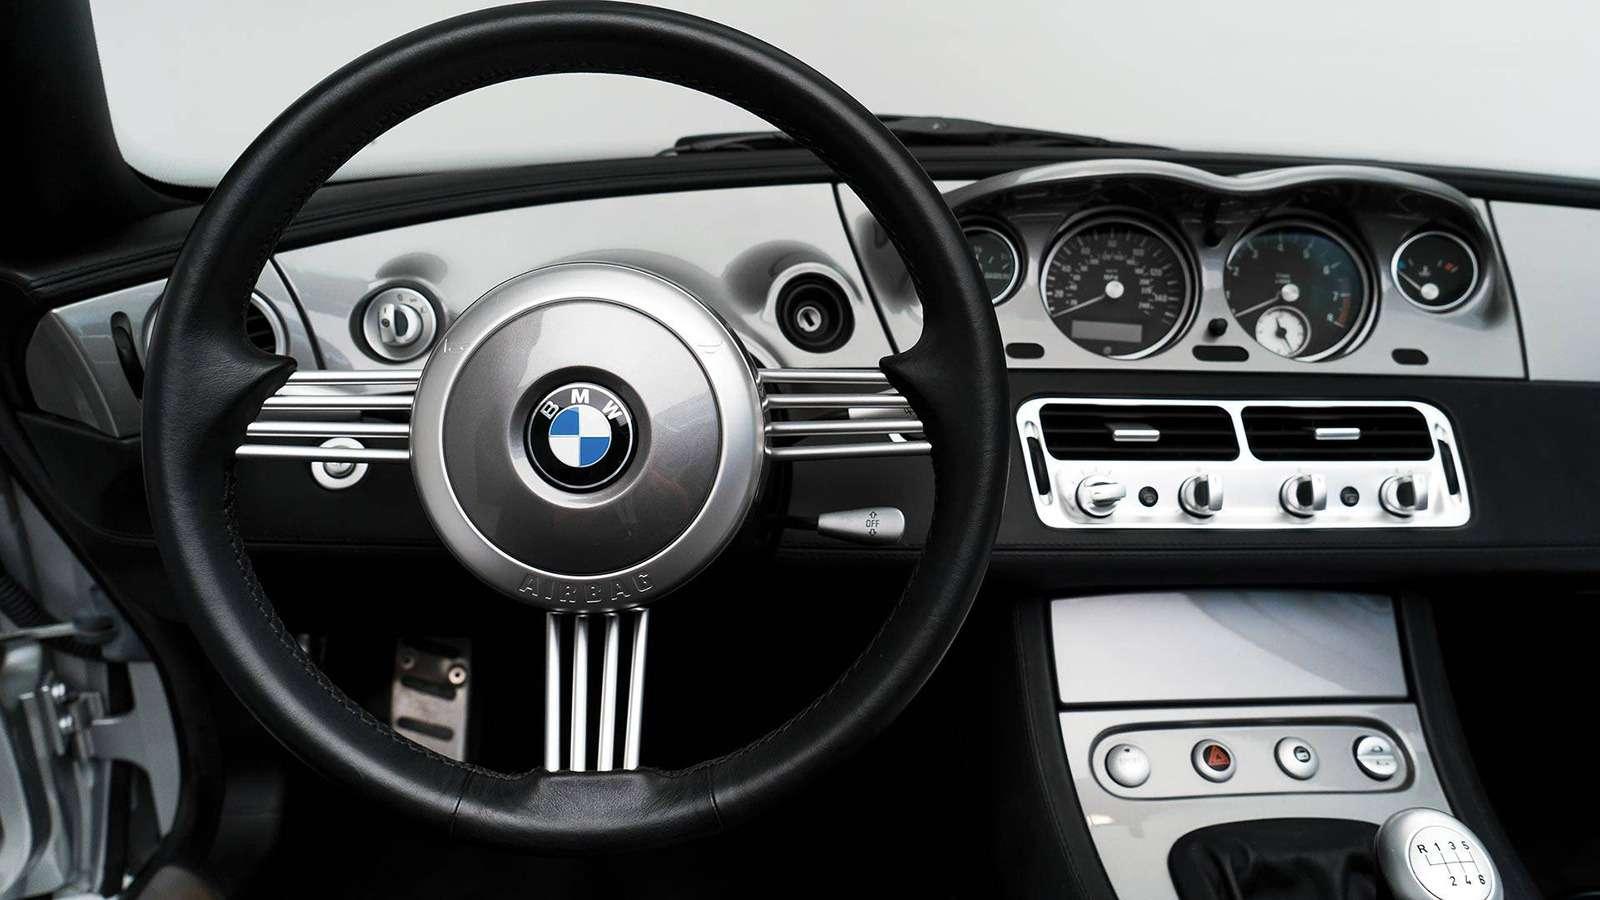 Автомобиль Стива Джобса продадут саукциона. Вместе стелефоном (ноэто не iPhone)— фото 811158